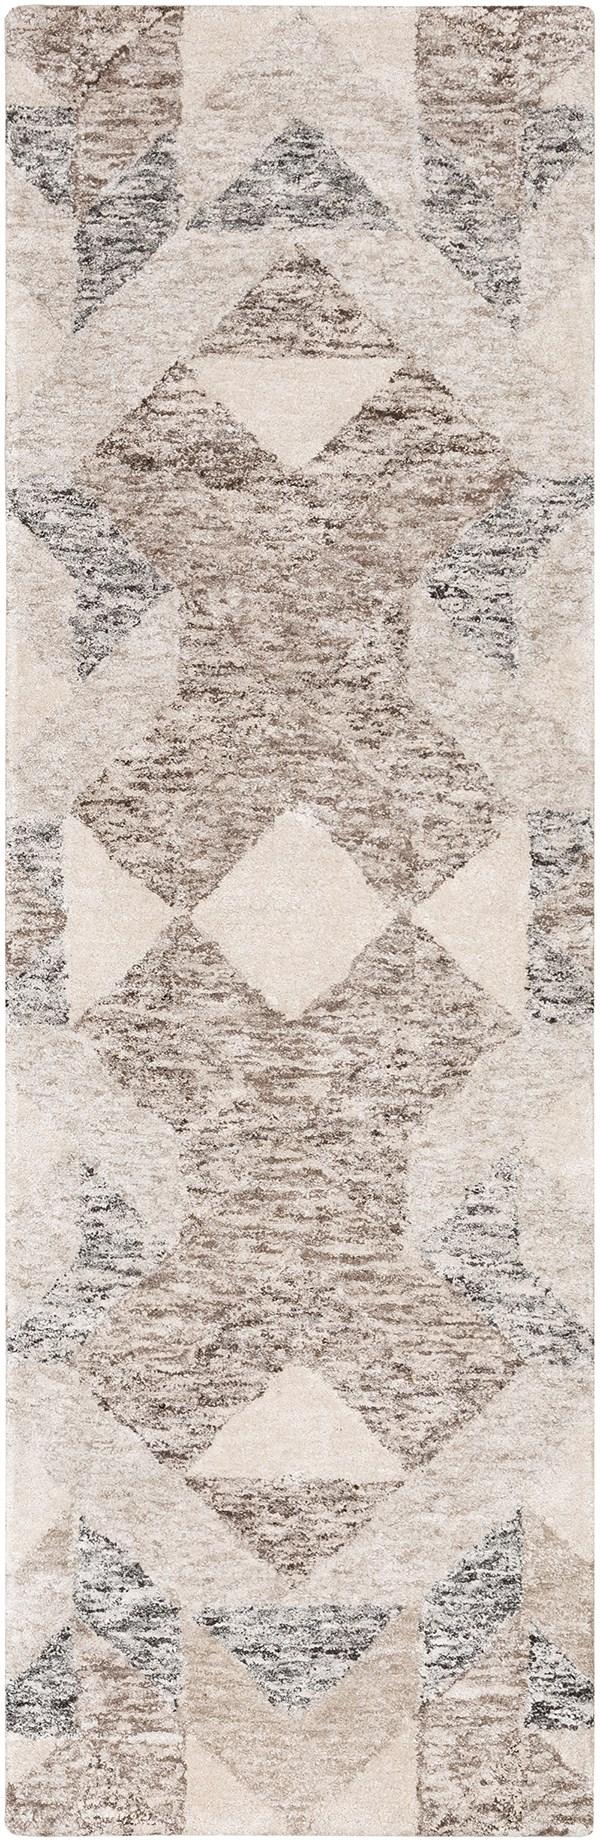 Camel, Dark Brown, Beige Geometric Area Rug